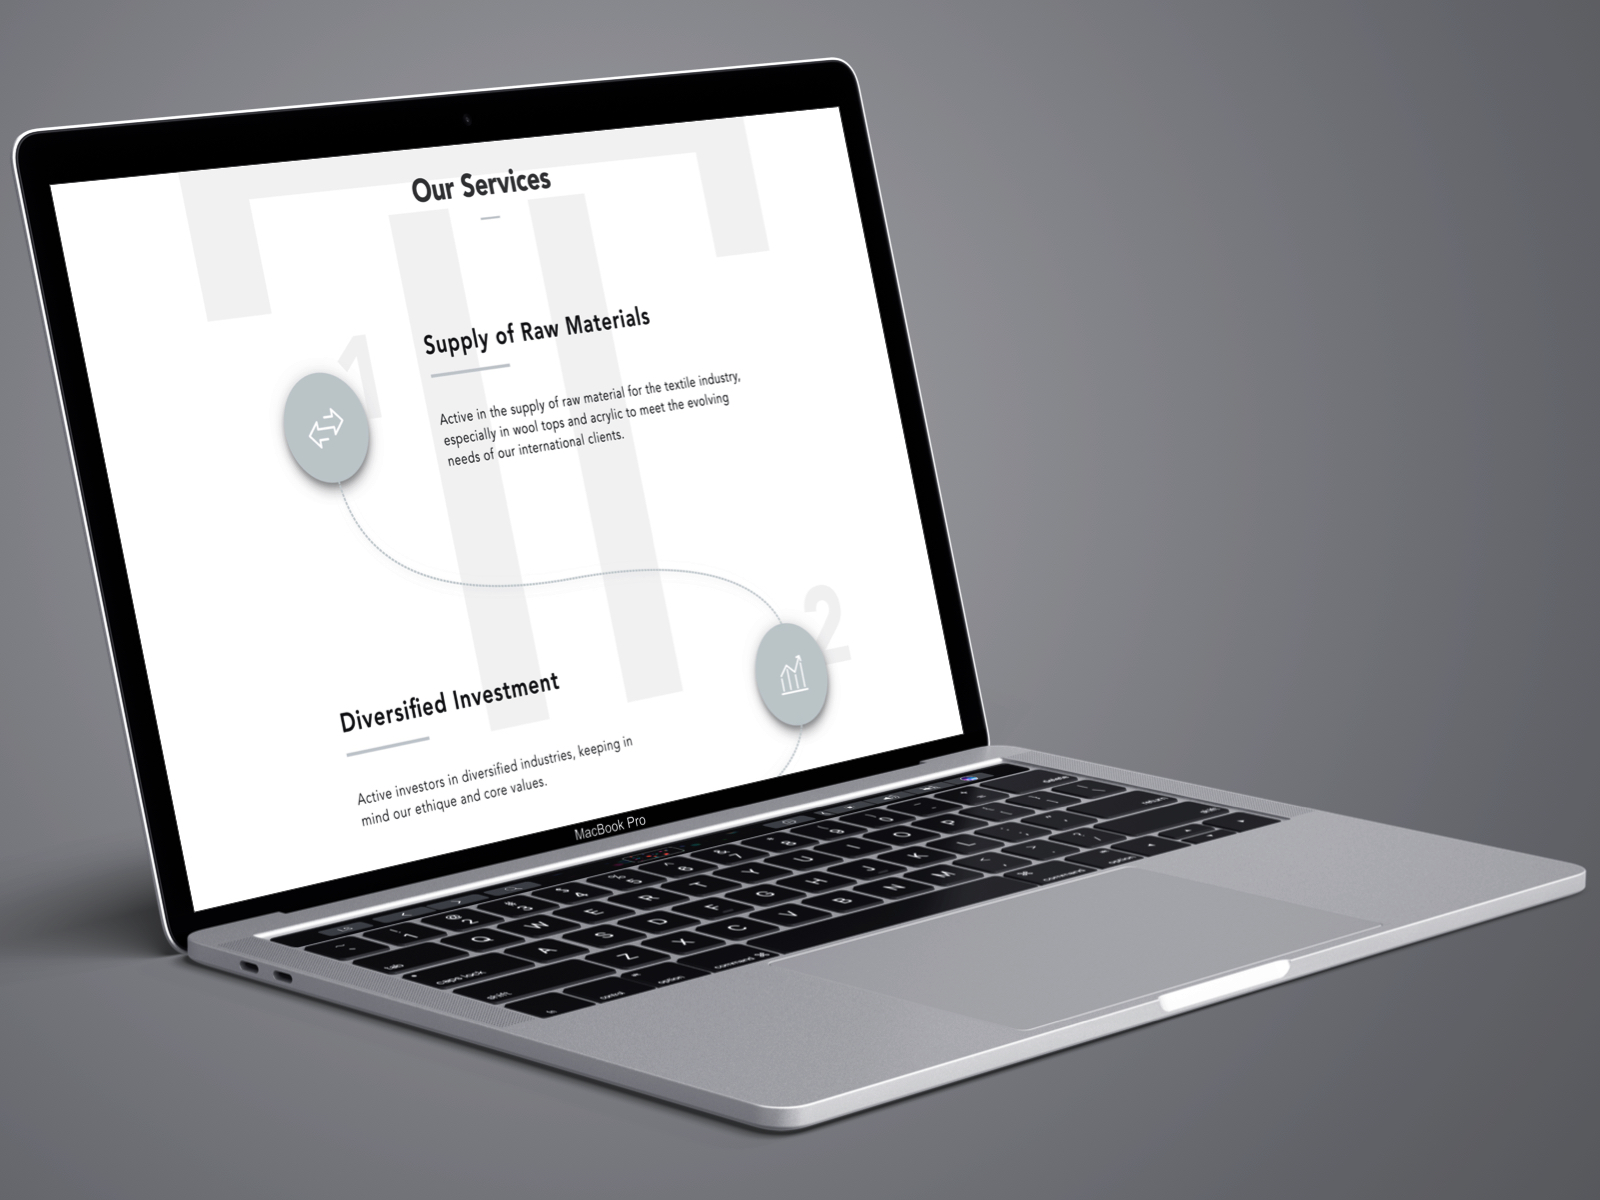 Tradevcogen mockup on left inclined macbook laptop showcasing Web & Responsive Design